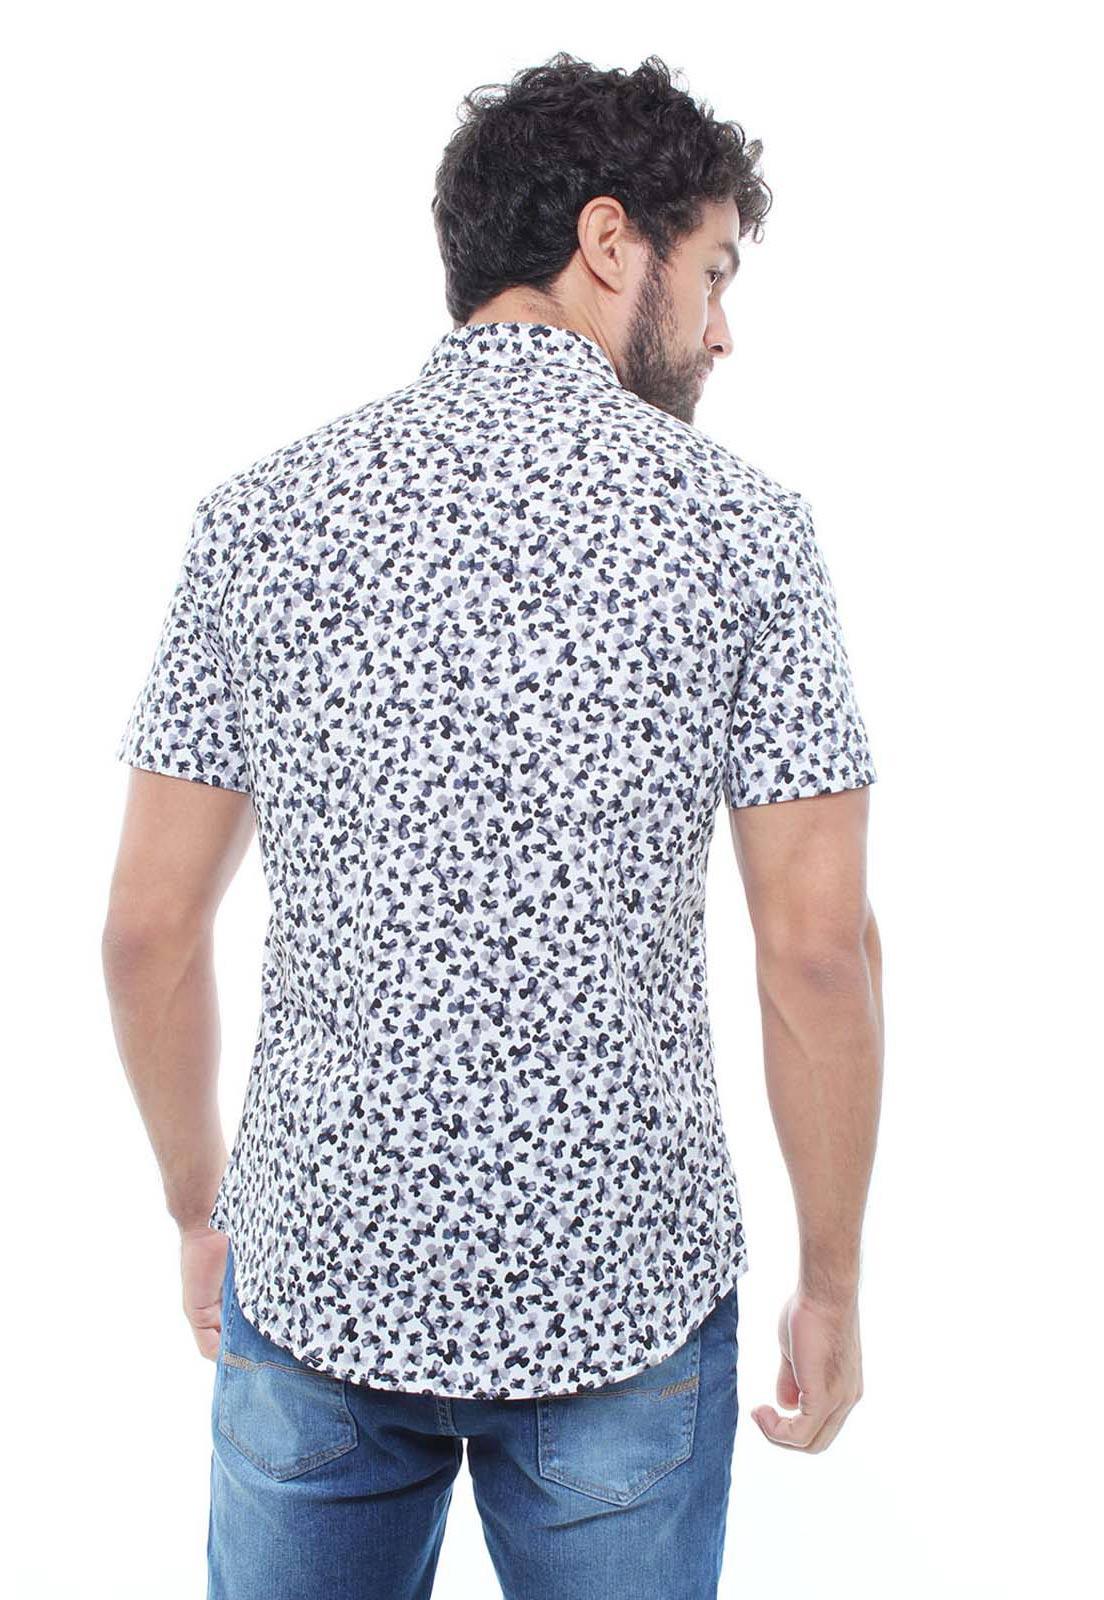 Camisa Estampada Masculina Manga Curta Crocker - 47931  - CROCKER JEANS